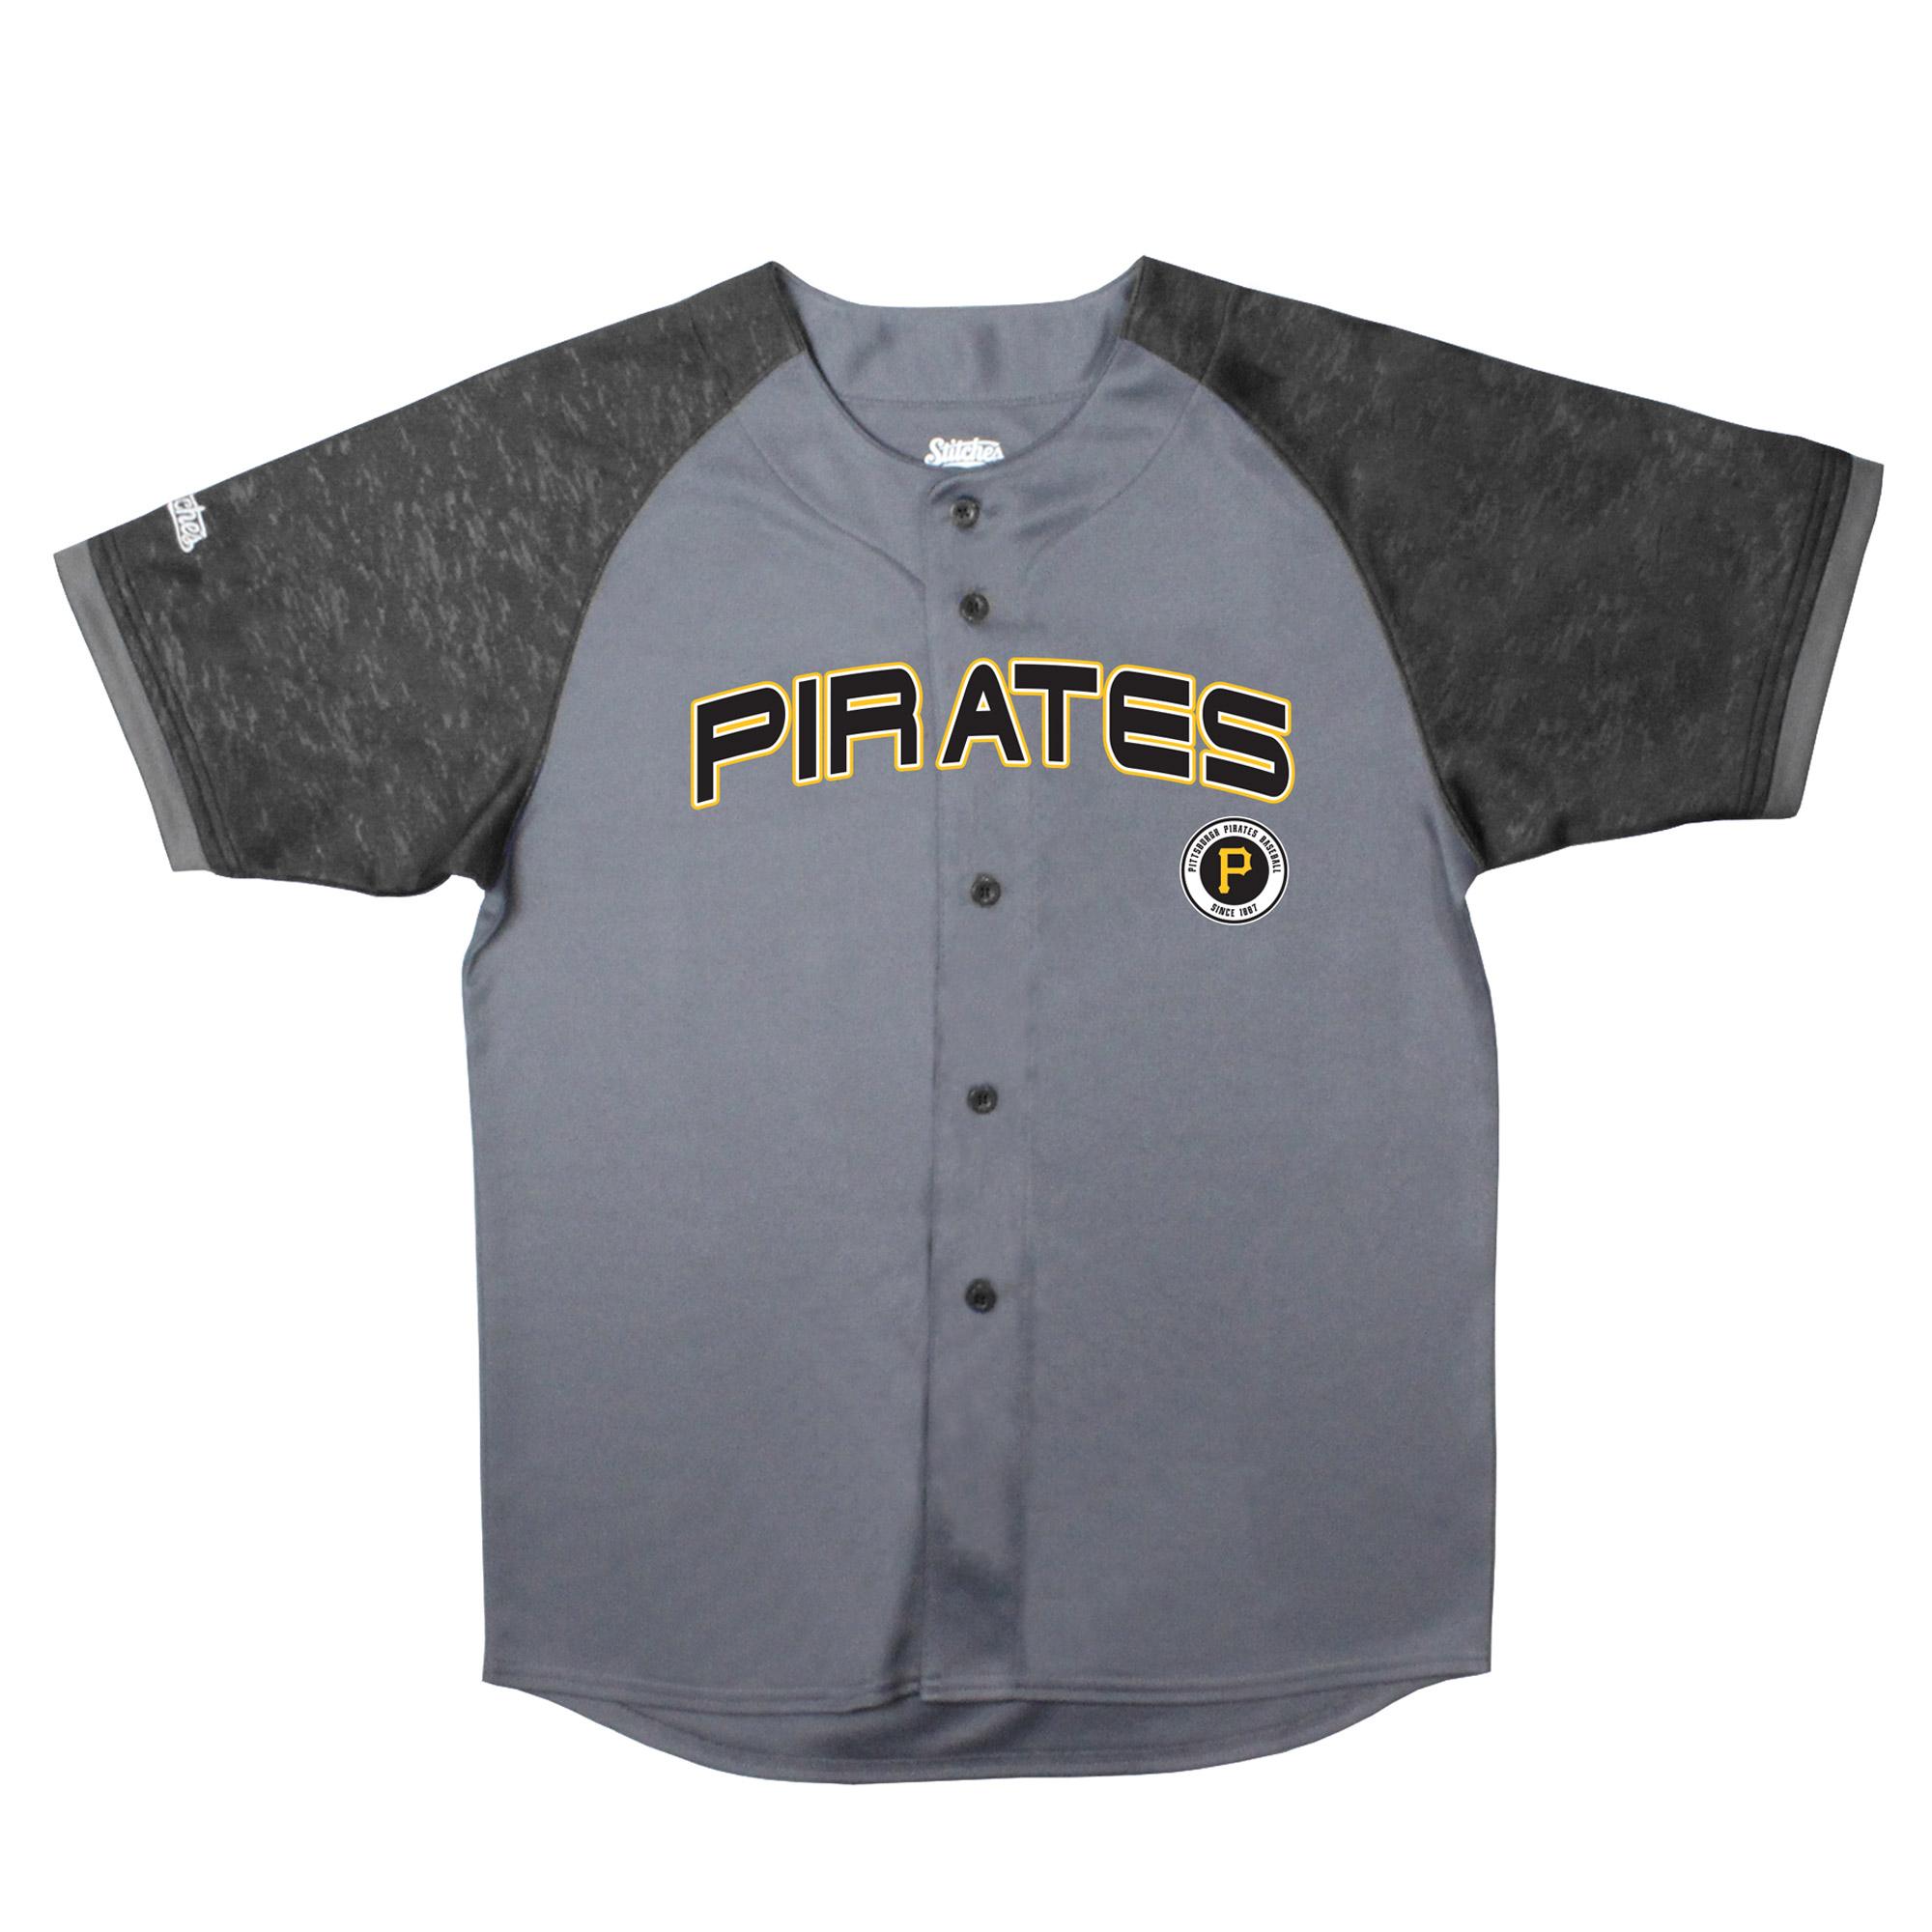 Pittsburgh Pirates Stitches Youth Glitch Jersey - Charcoal/Black